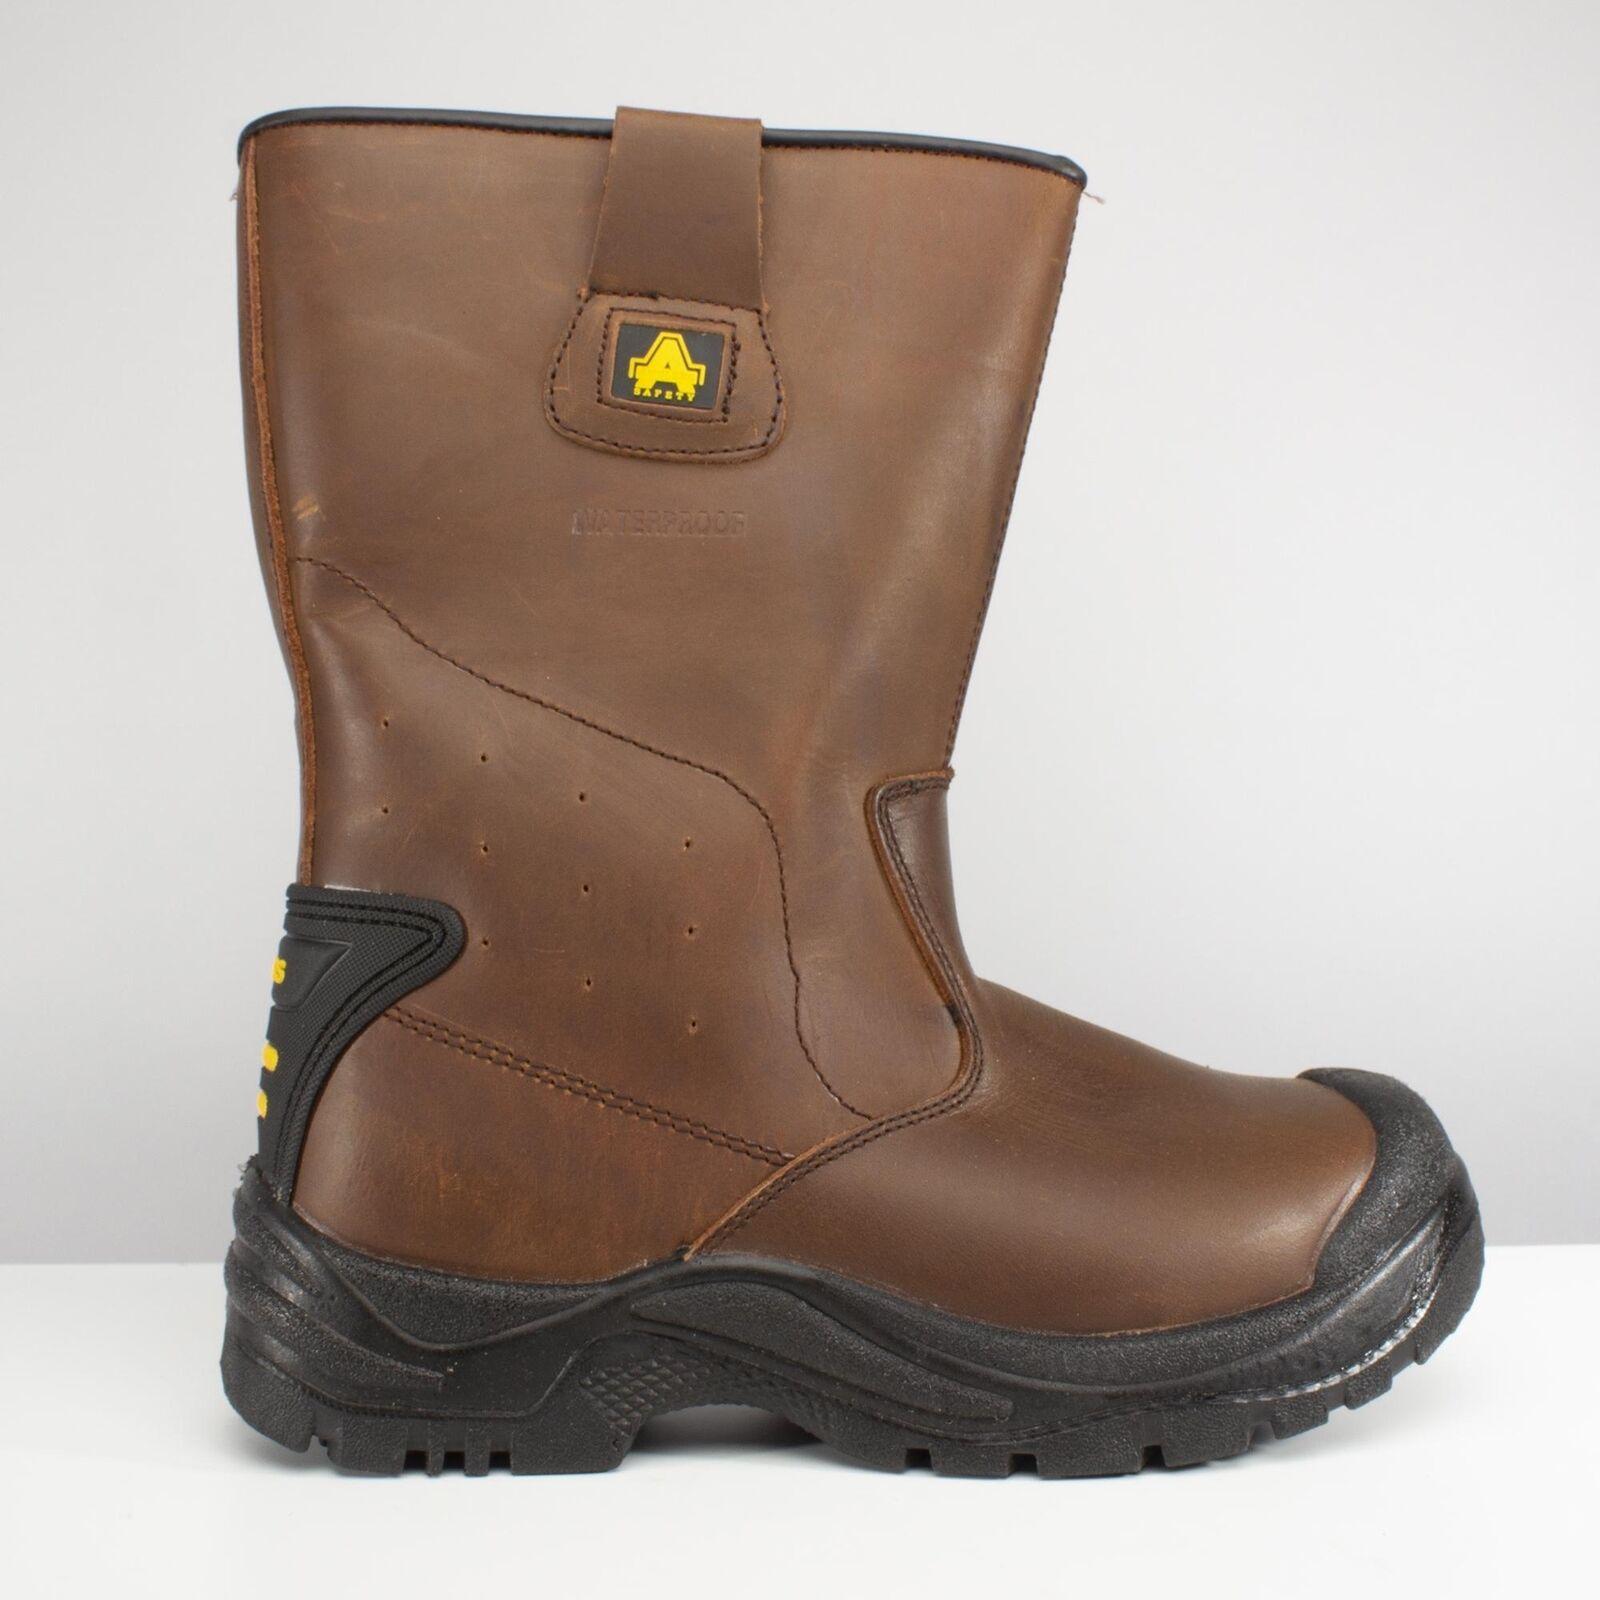 Amblers Safety AS249 Cadair Unisex para Hombre Damas Rigger botas De Seguridad S3 Marrón